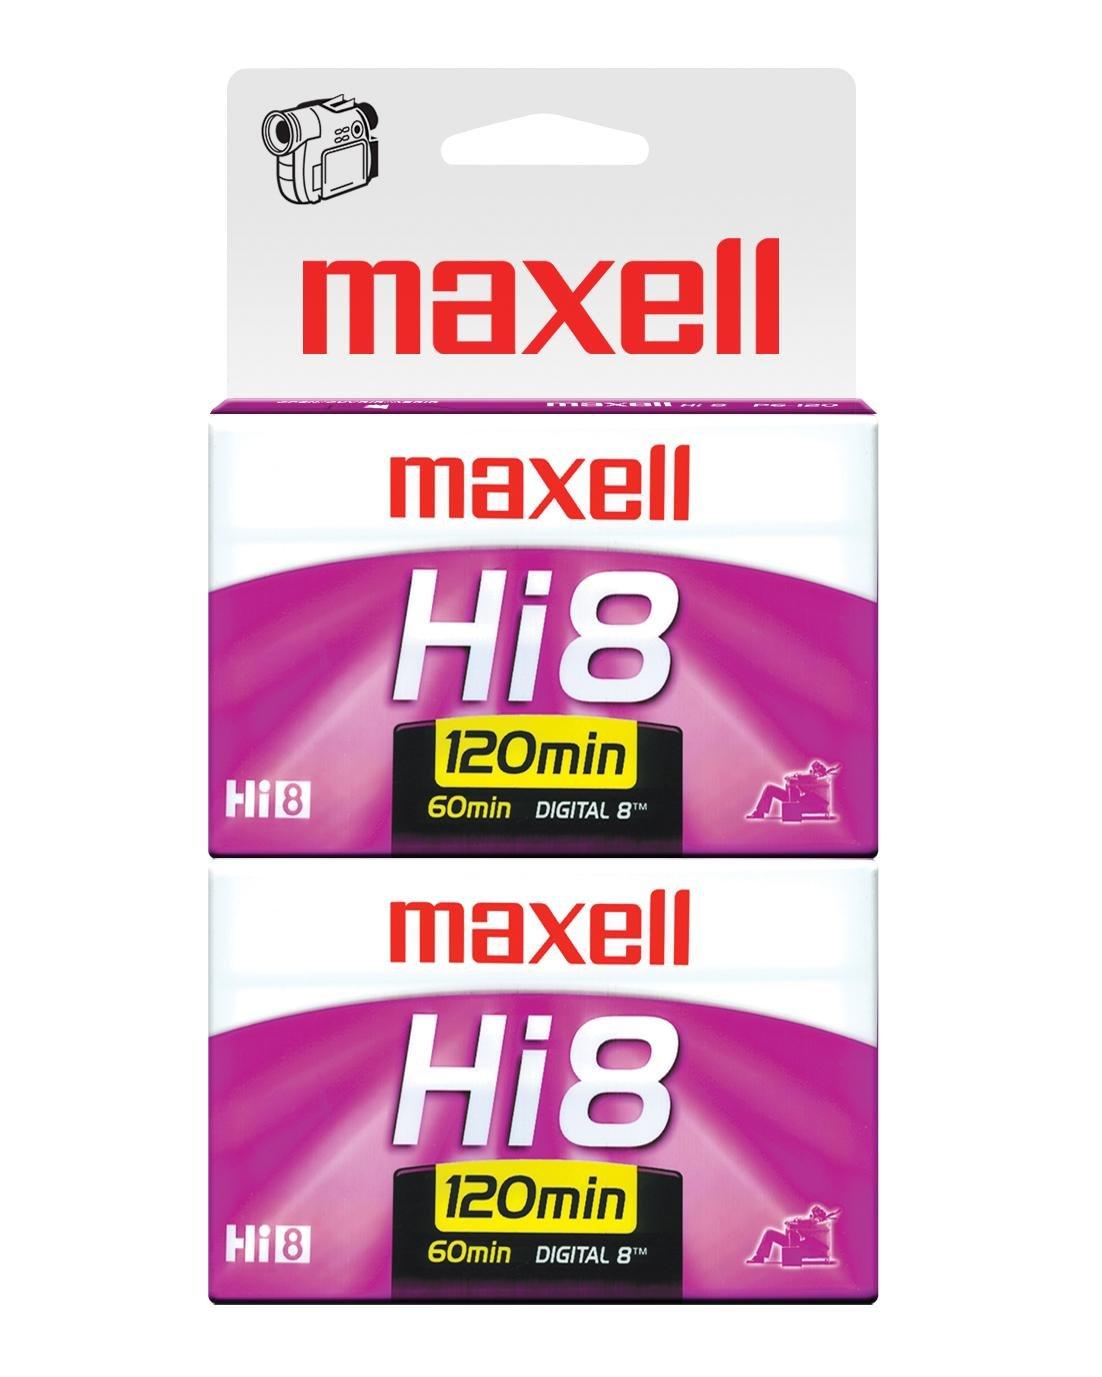 Maxell 281120 XRMP6-120, 2-Pack XR-M P6-120 2PK